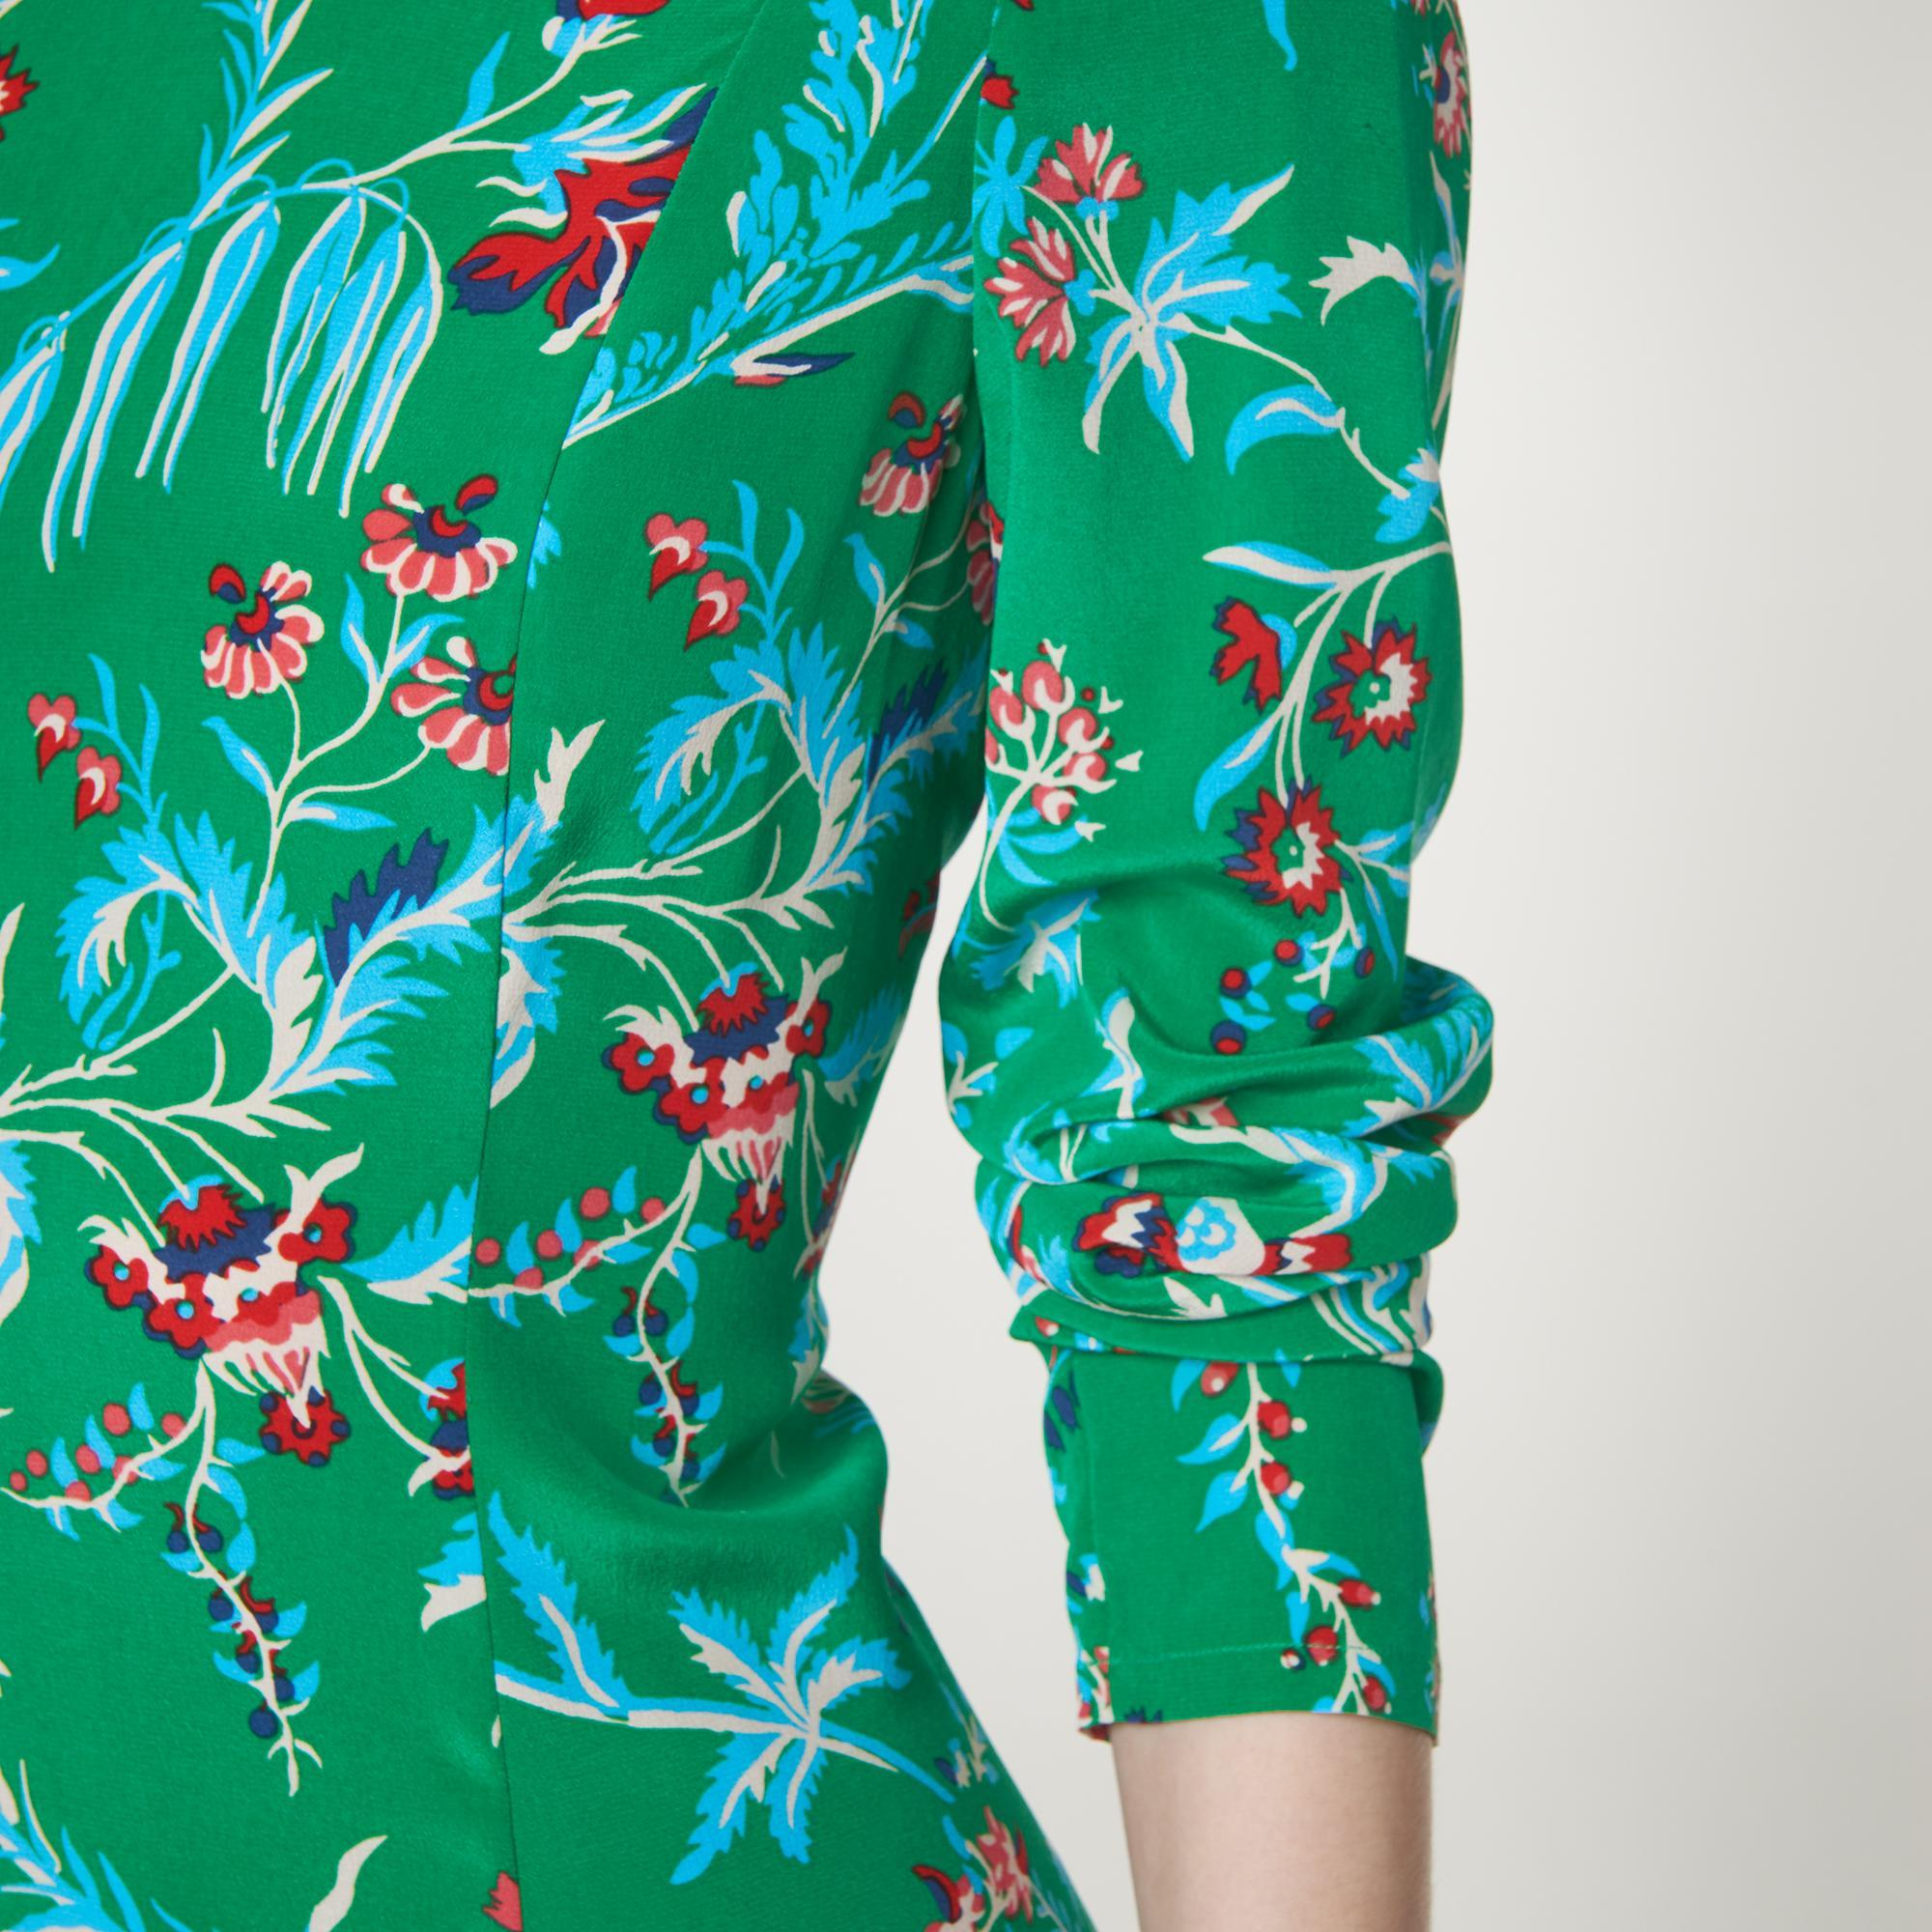 73a966216ecb L.K.Bennett Leanie Wildflower Print Green Silk Midi Dress in Green ...